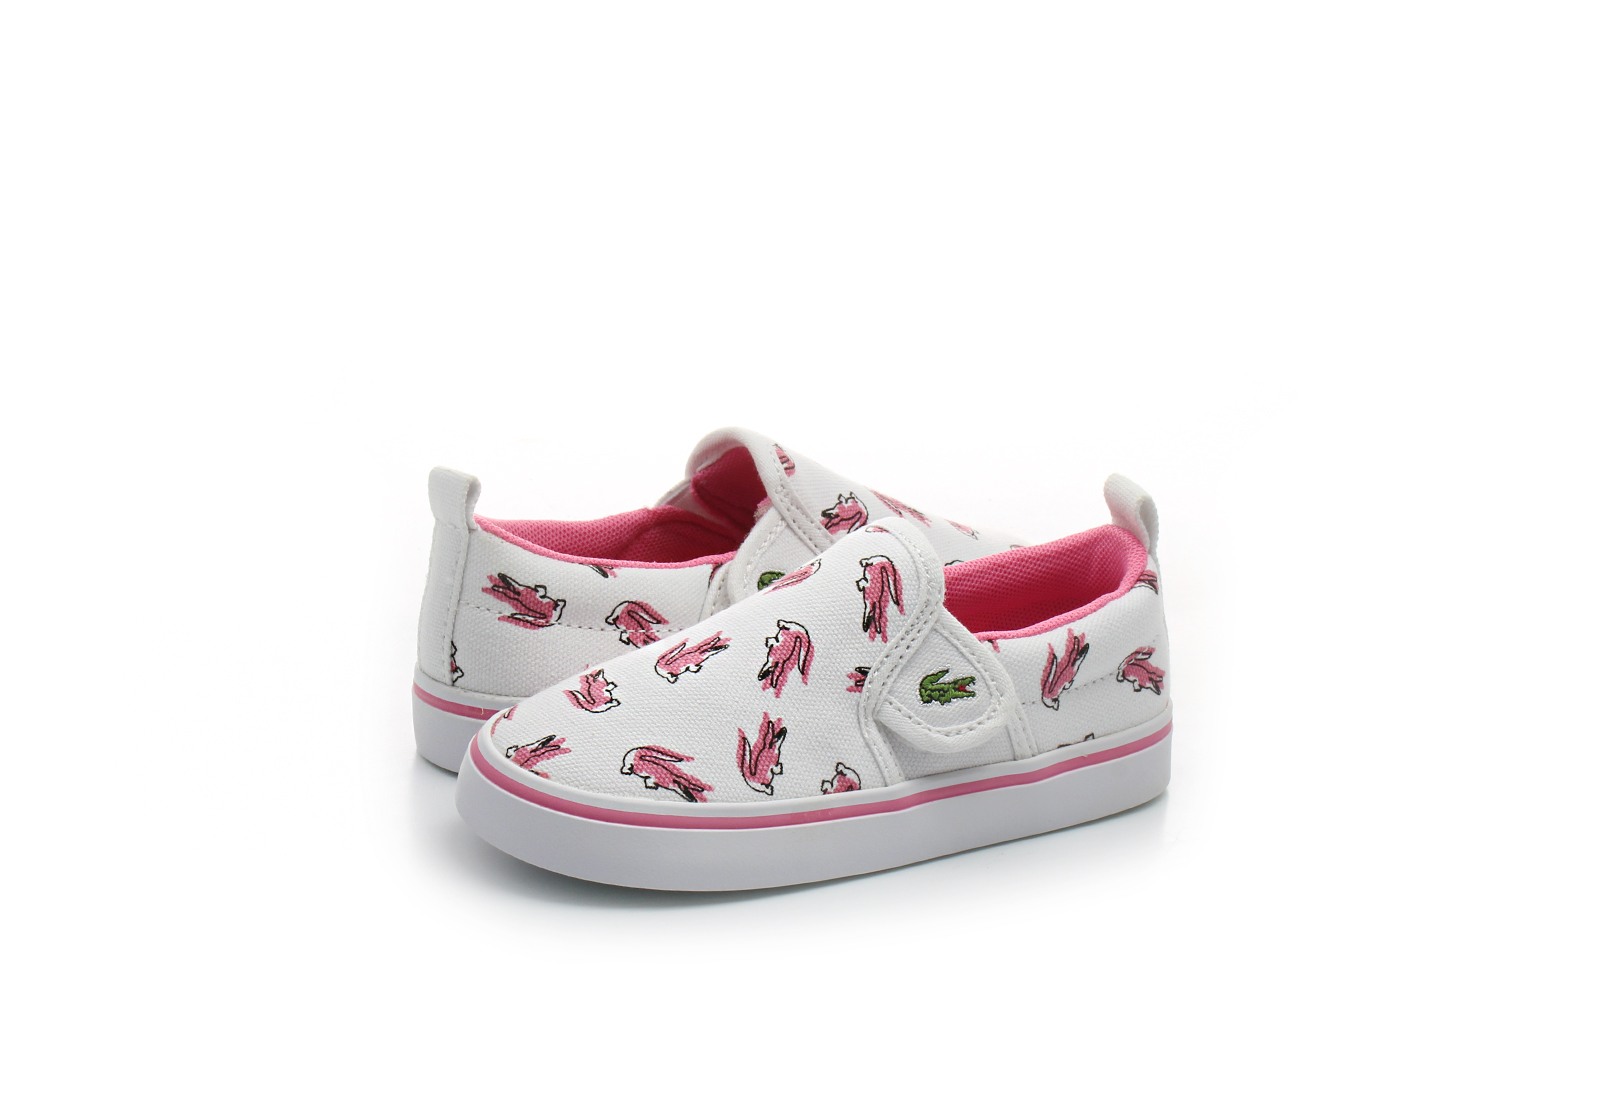 c5a69d157e77 Lacoste Fűző Nélküli - Gazon 118 1 - 181cai0006-b53 - Office Shoes ...